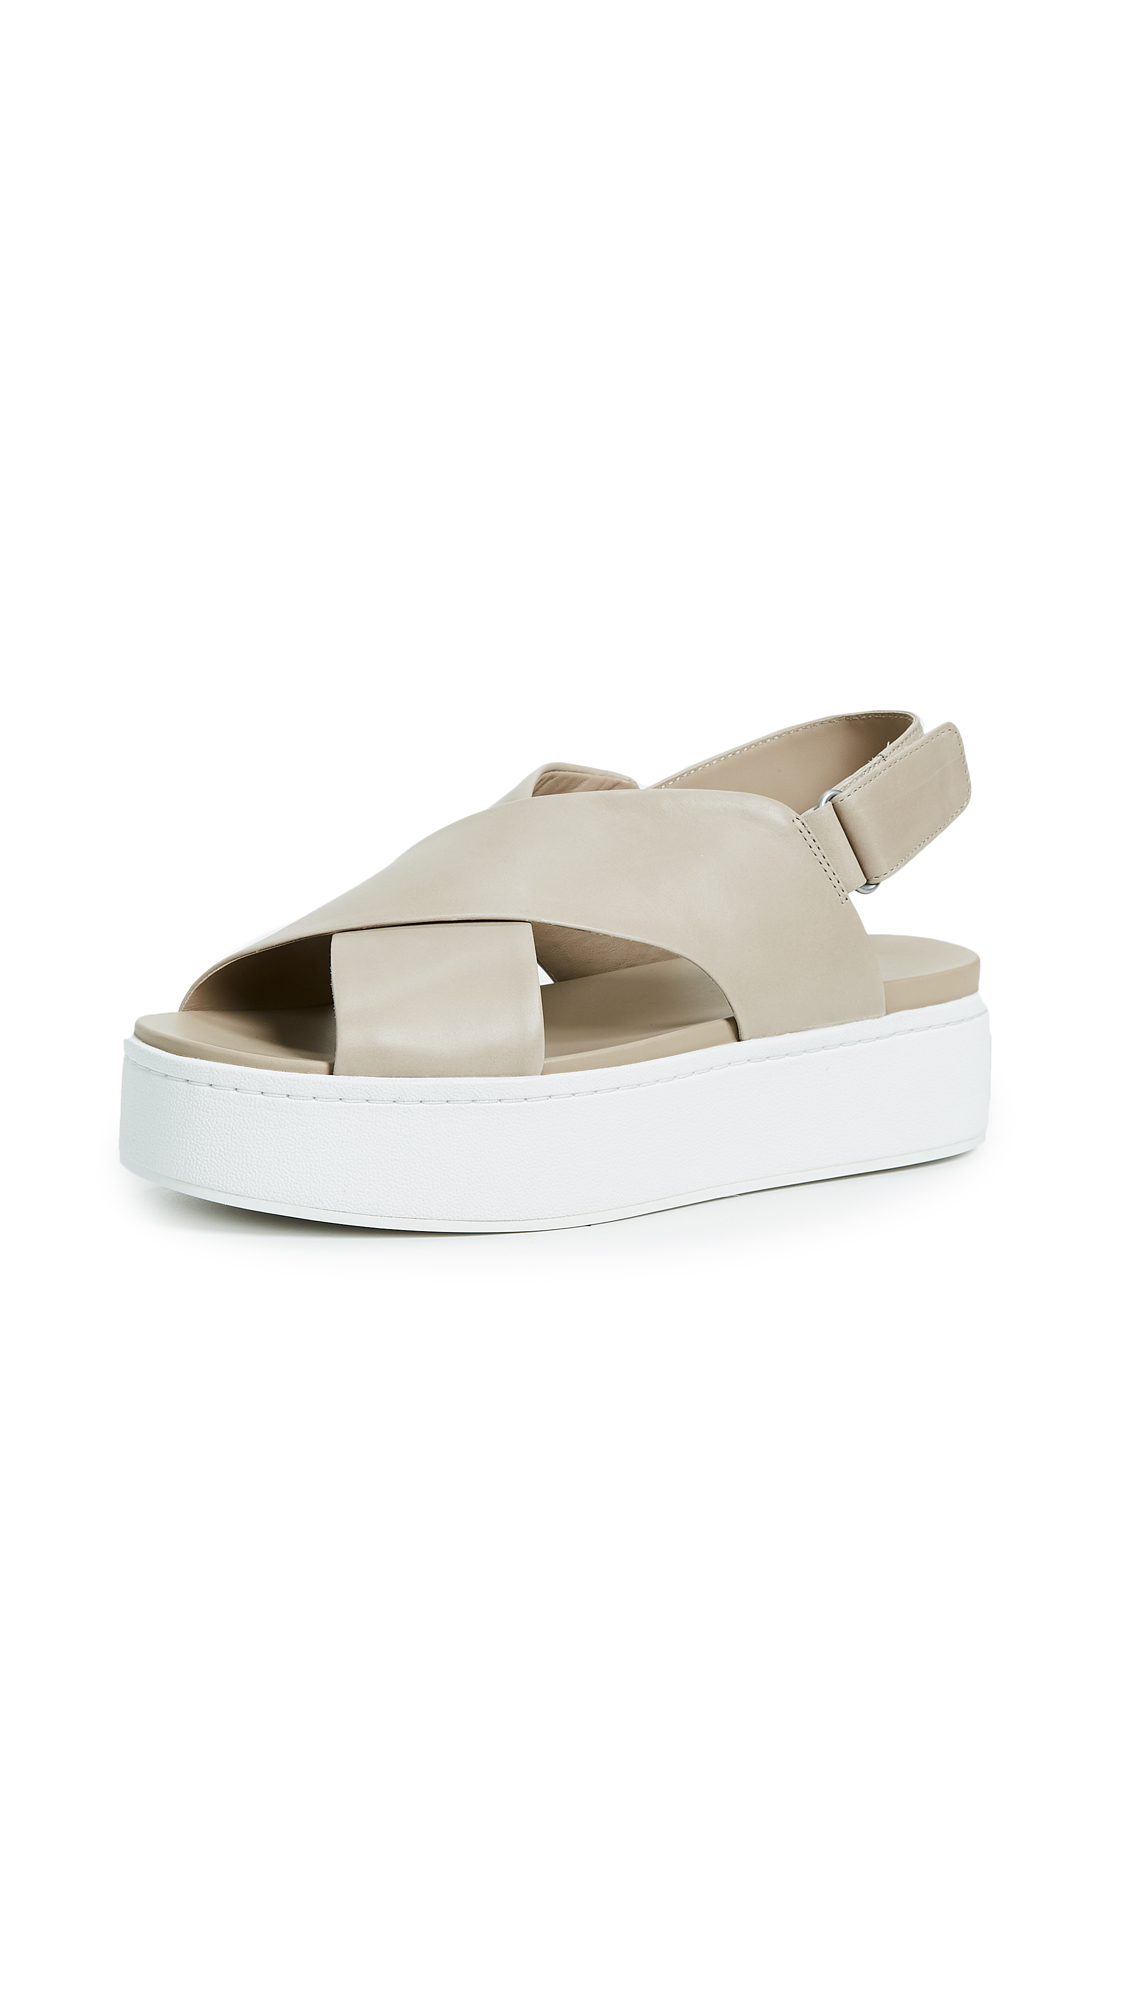 Vince Weslan Crisscross Flatform Sandals - Lt Straw